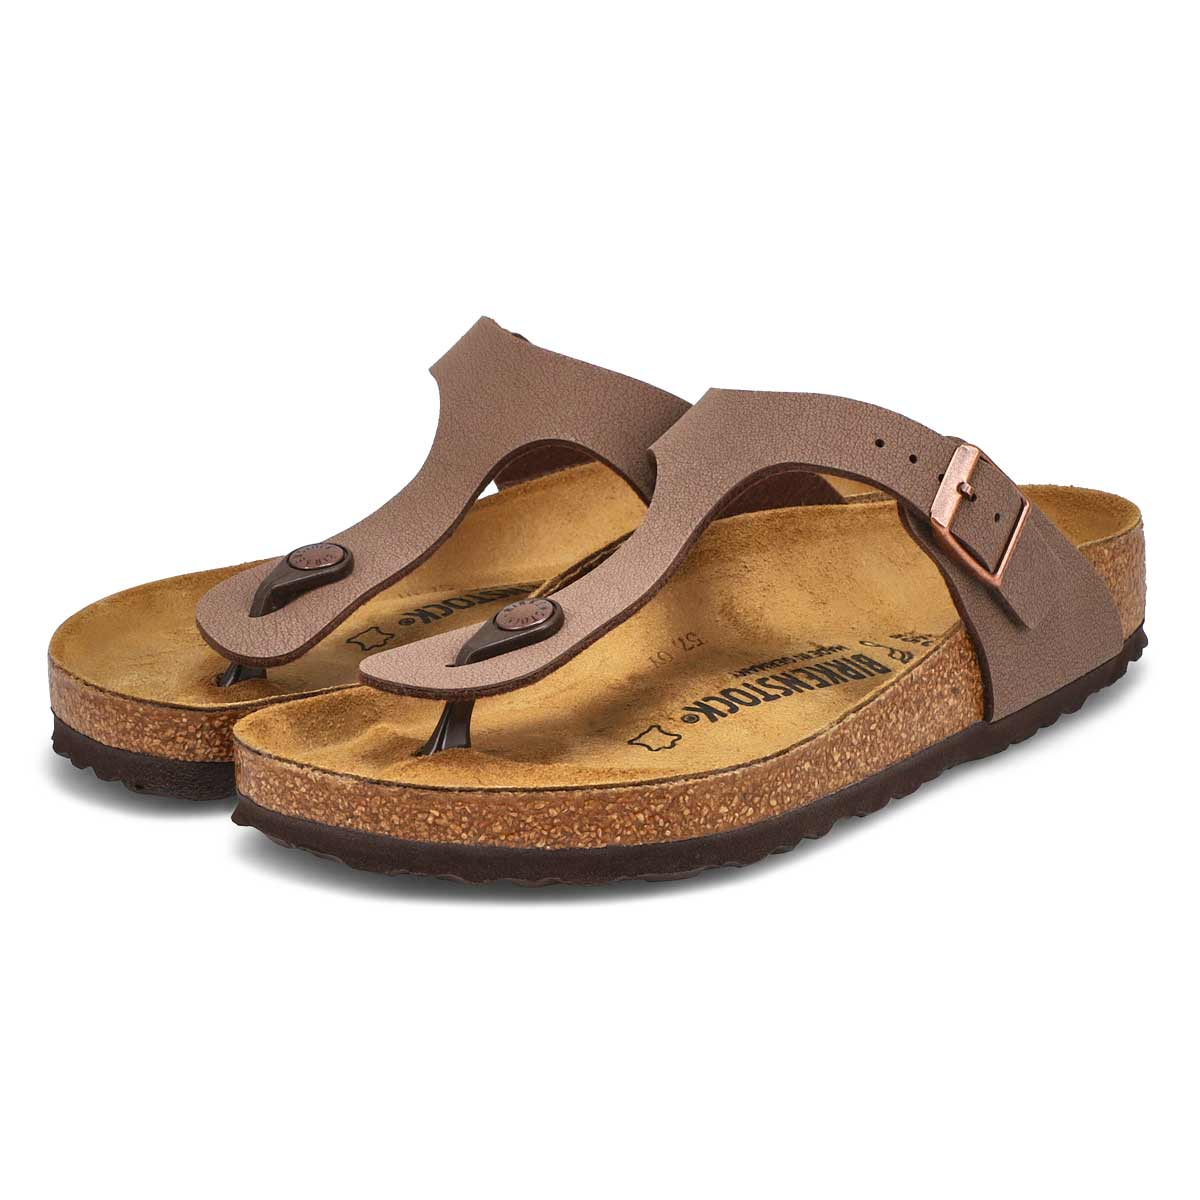 Sandales tongs Gizeh BF, moka, femme